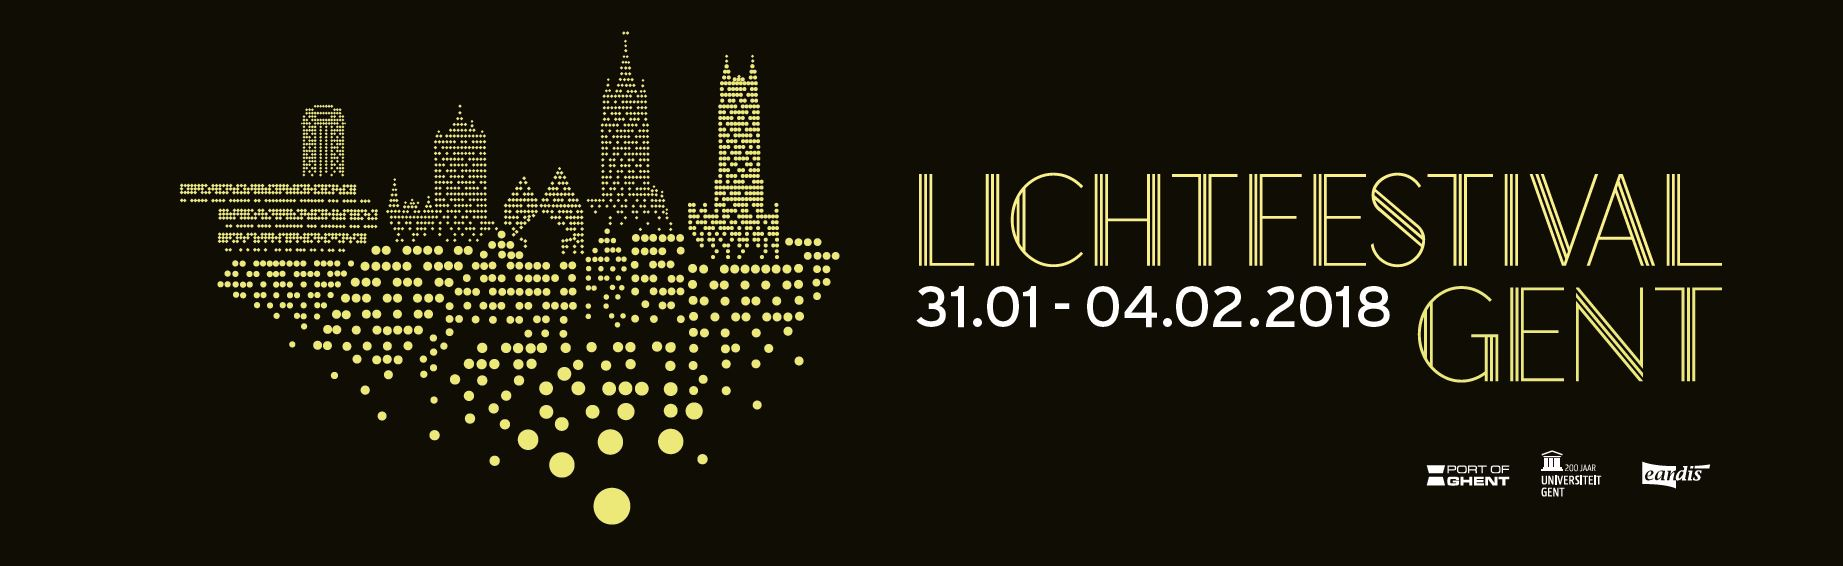 banner-lichtfestival2018.JPG